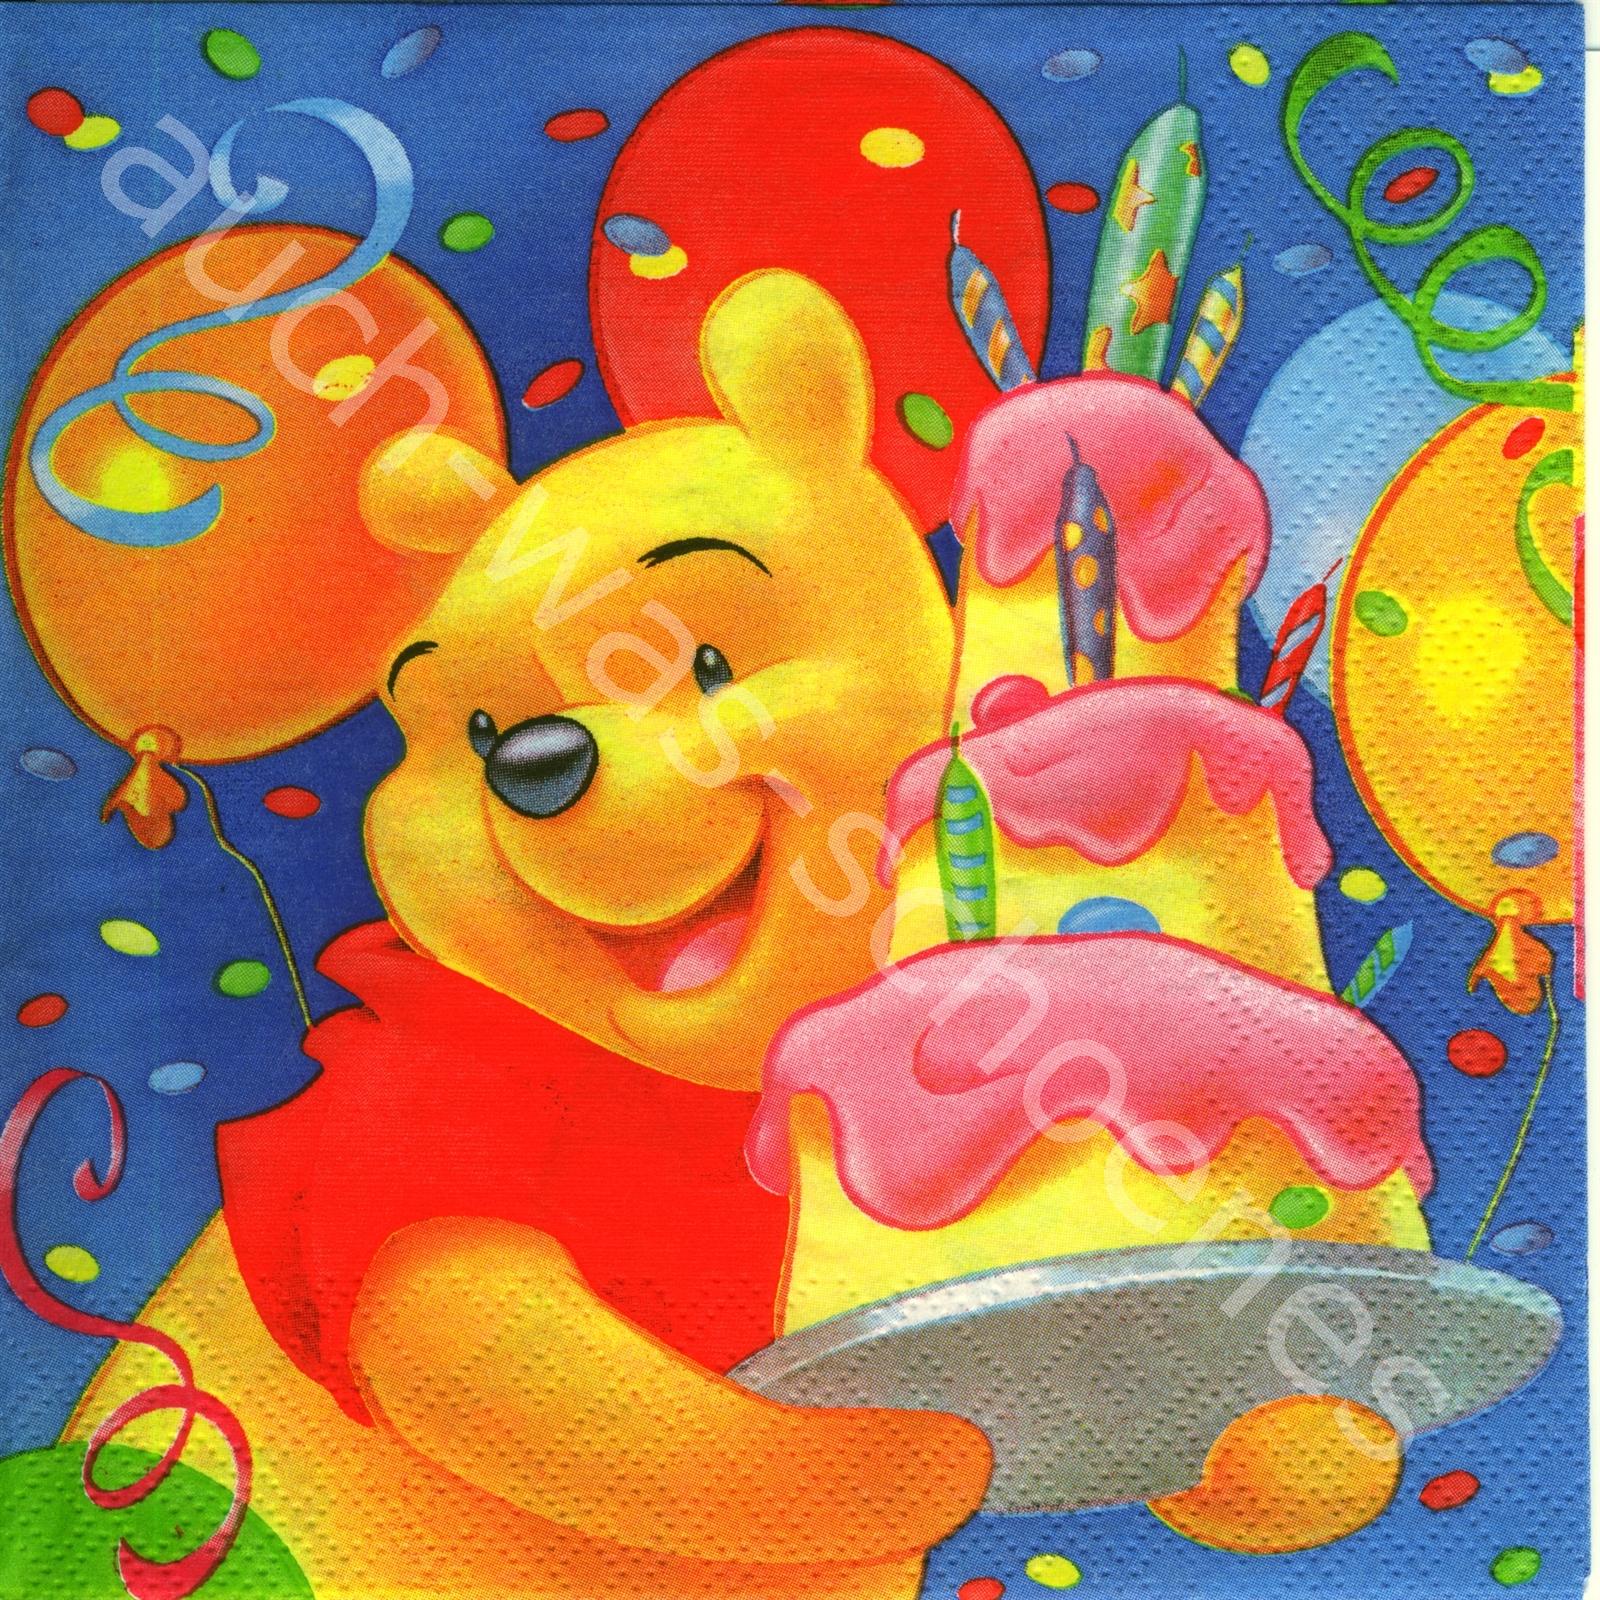 32c53be7b841 auch-was-schoenes.de - Disney - Winnie Pooh - Birthday